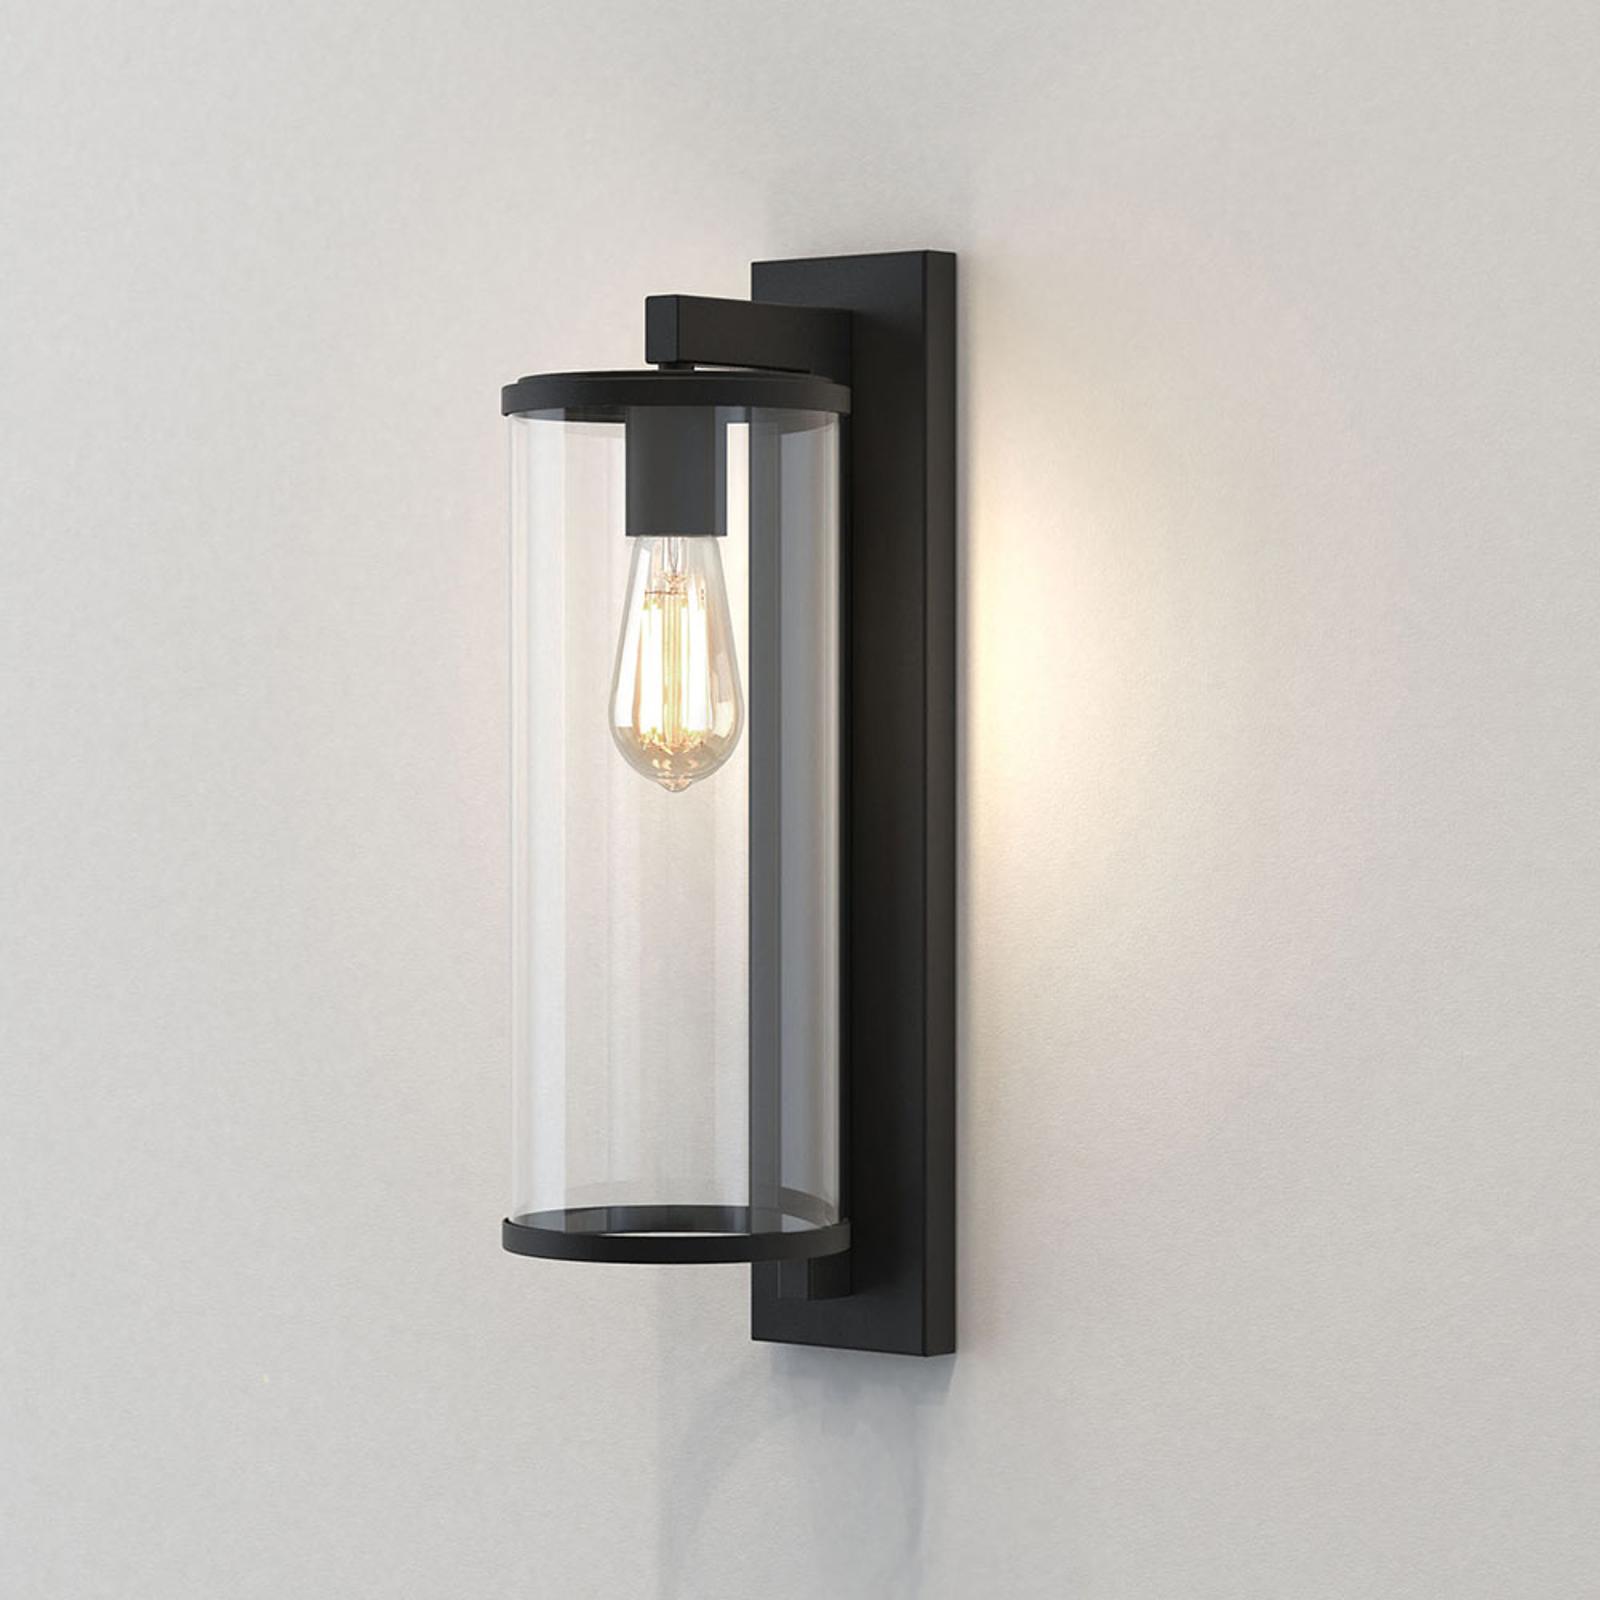 Astro Pimlico 500 wandlamp, zwart